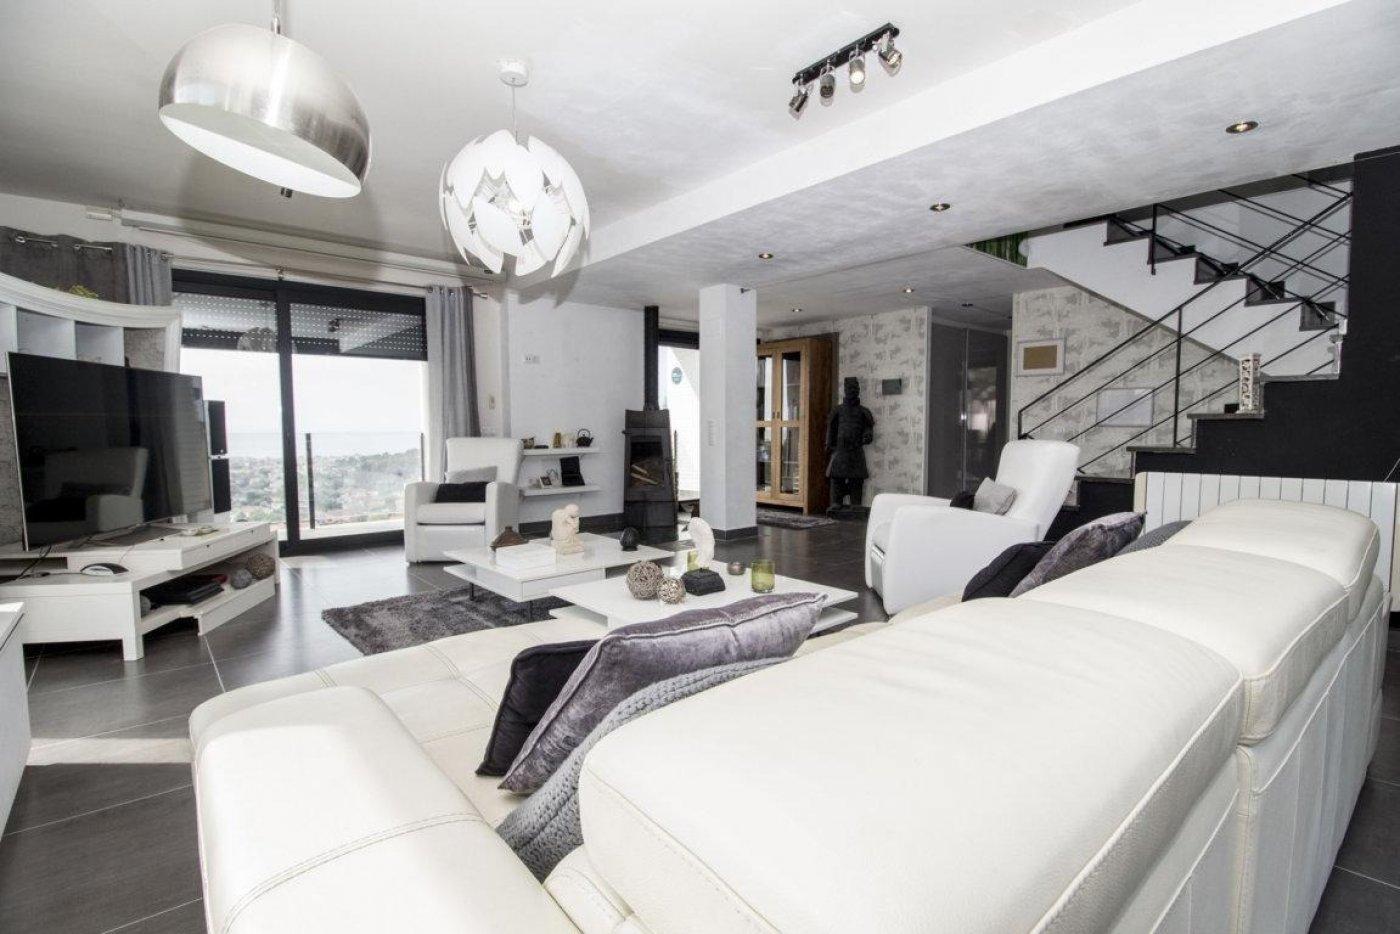 Casa exclusiva con piscina - imagenInmueble4